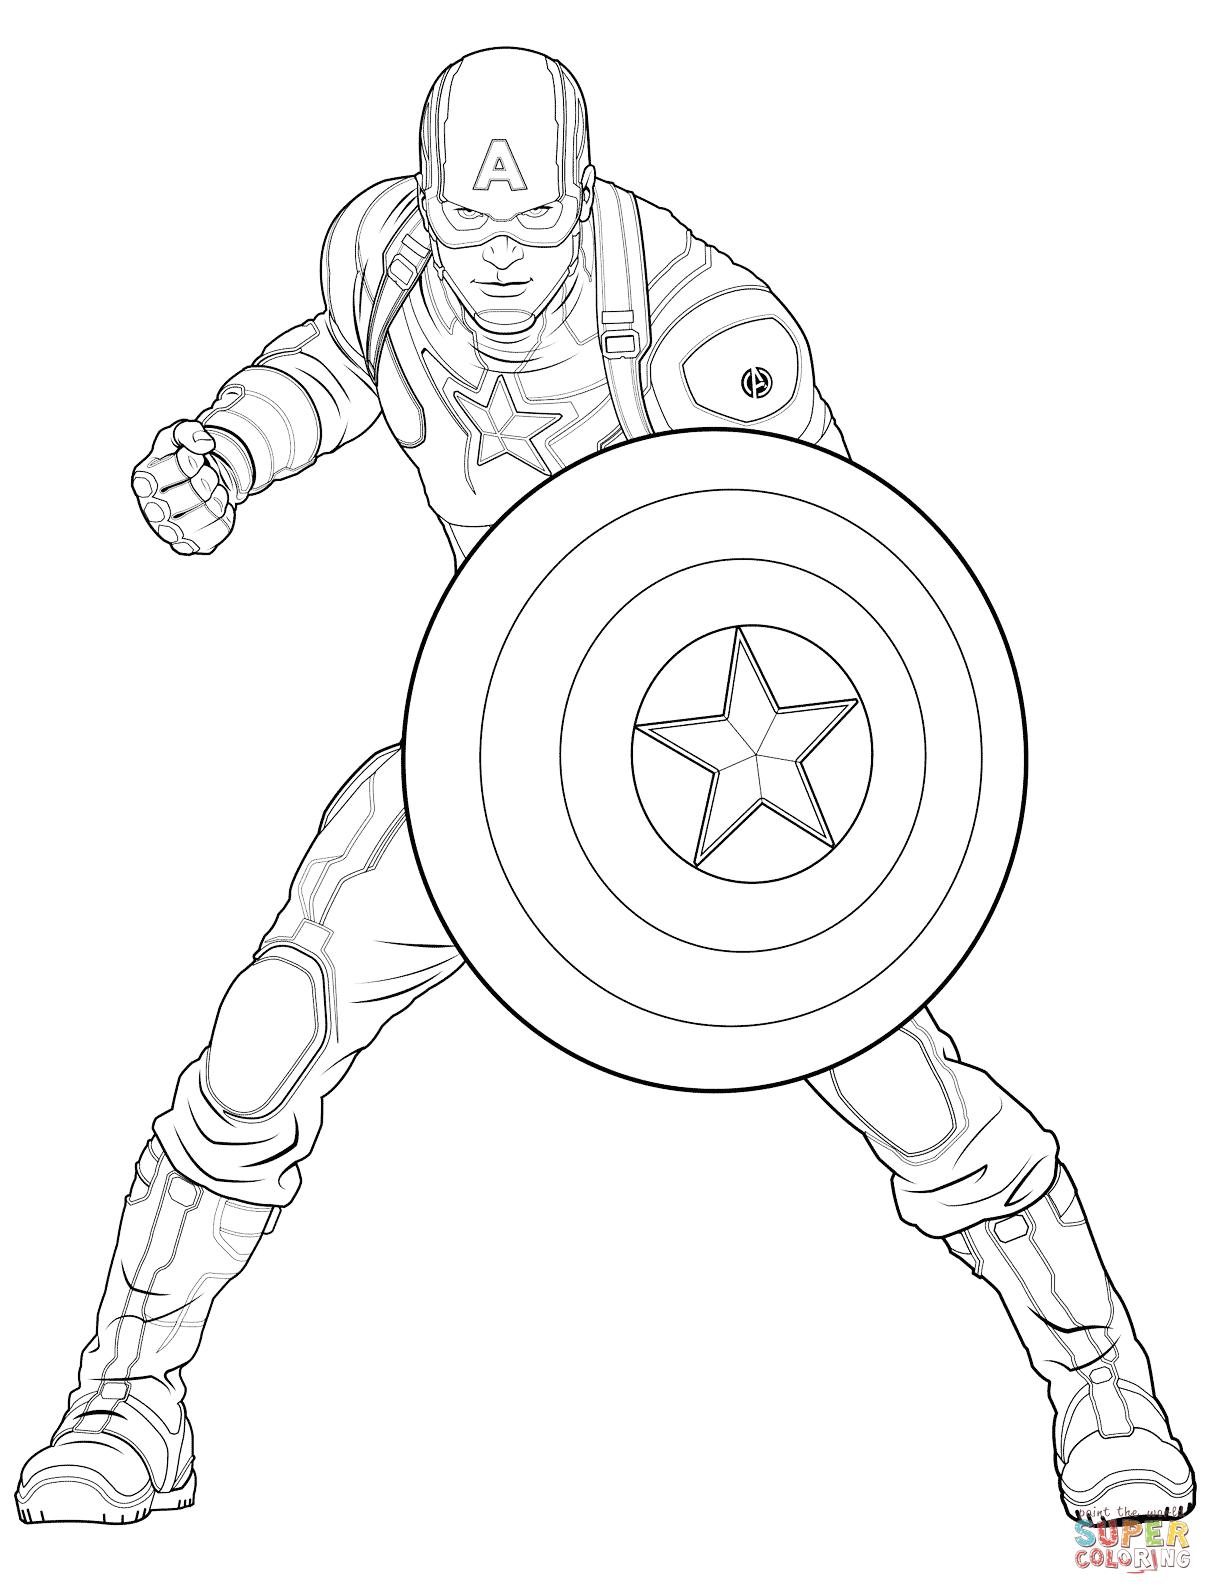 Avengers Captain America | Super Coloring | Kifestå�